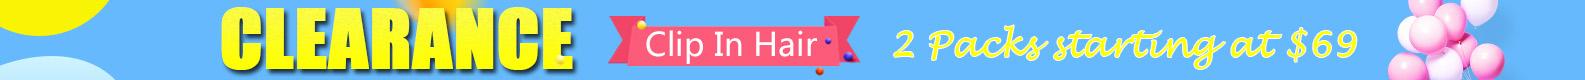 clearance clip in hair